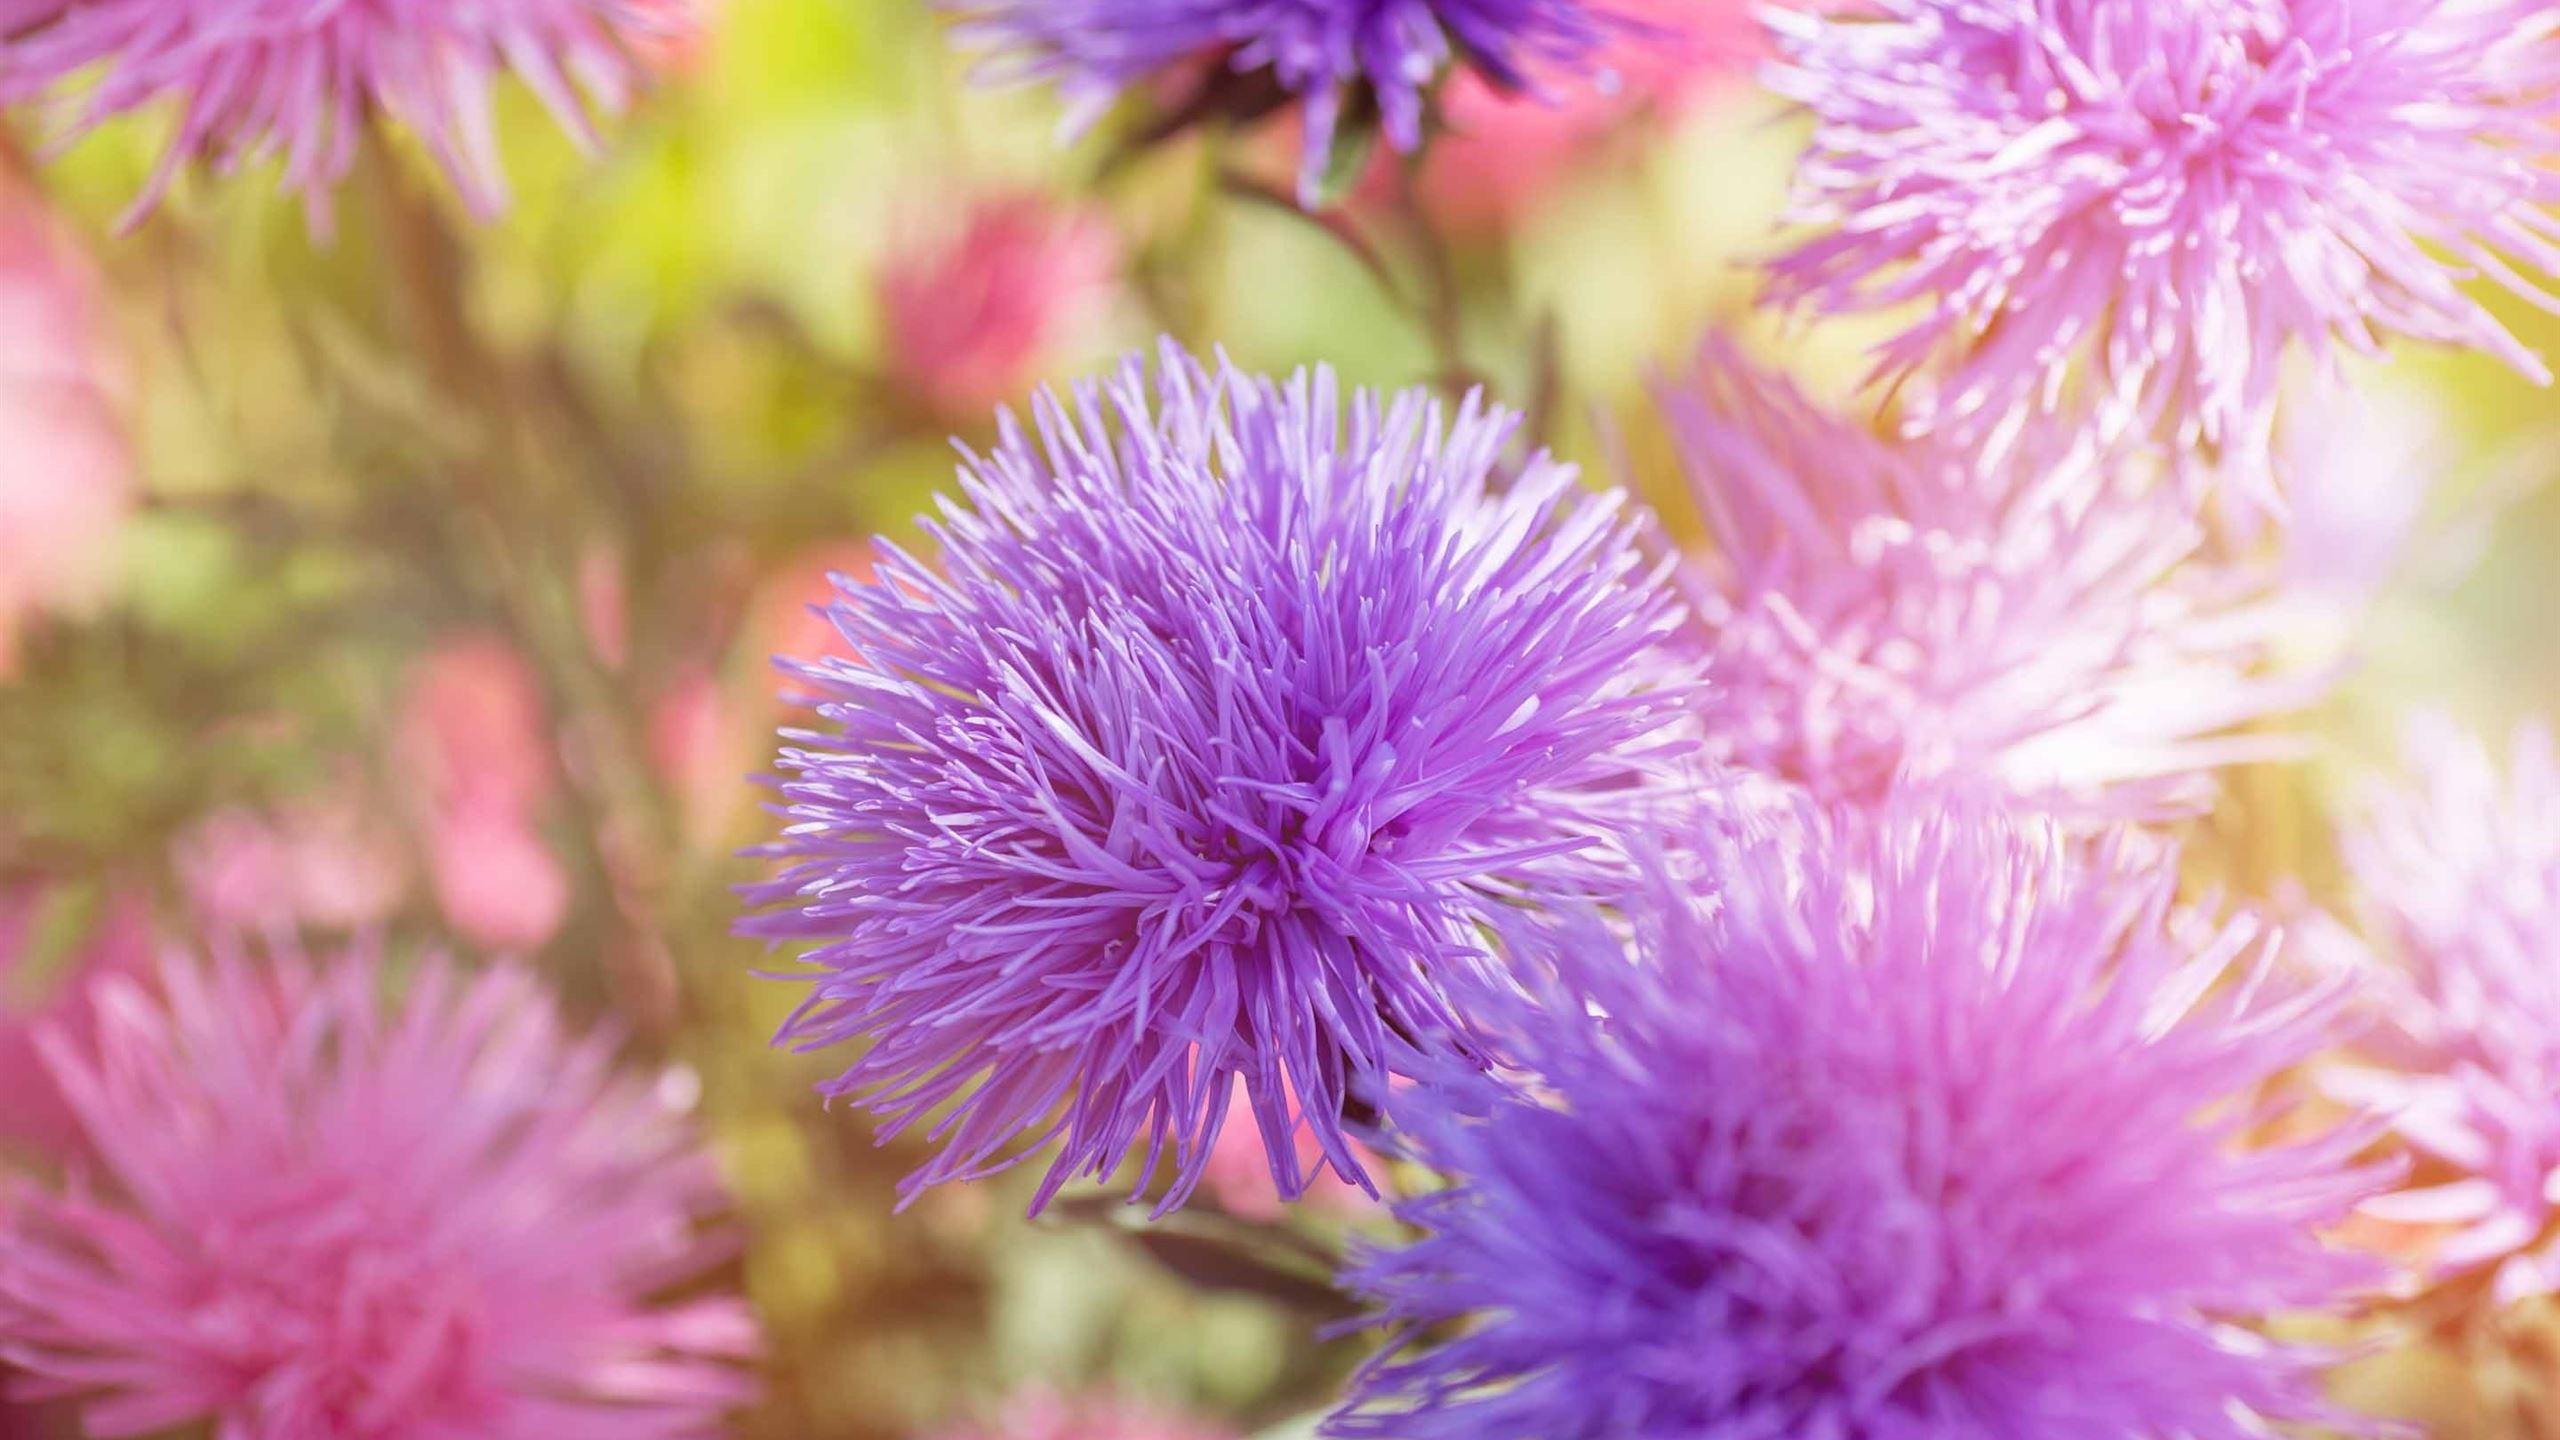 Purple Fluffy Flowers Mac Wallpaper Download | AllMacWallpaper